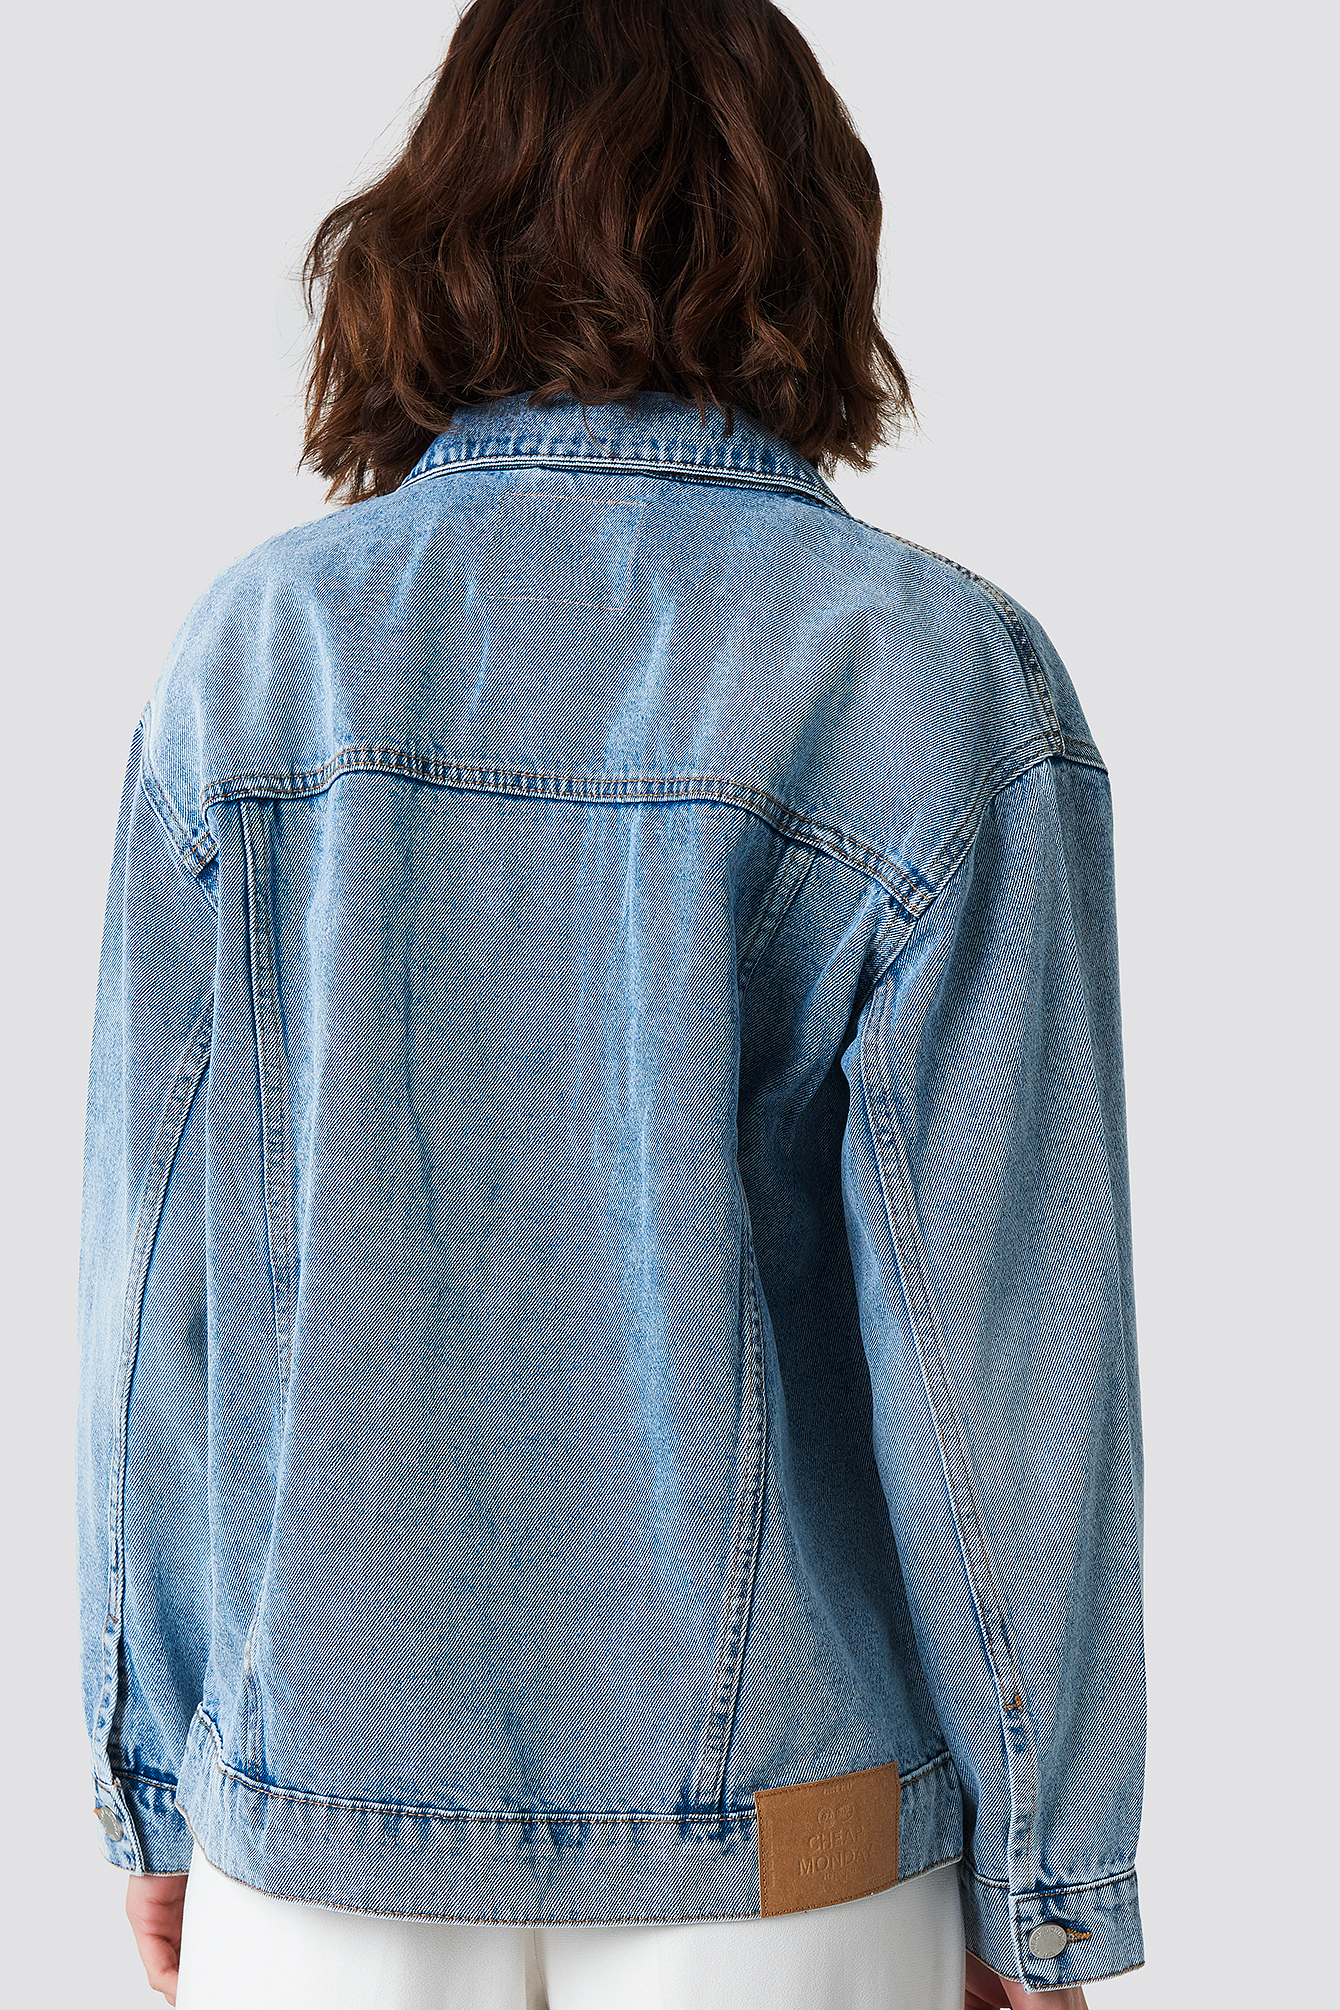 Upsize Jacket NA-KD.COM